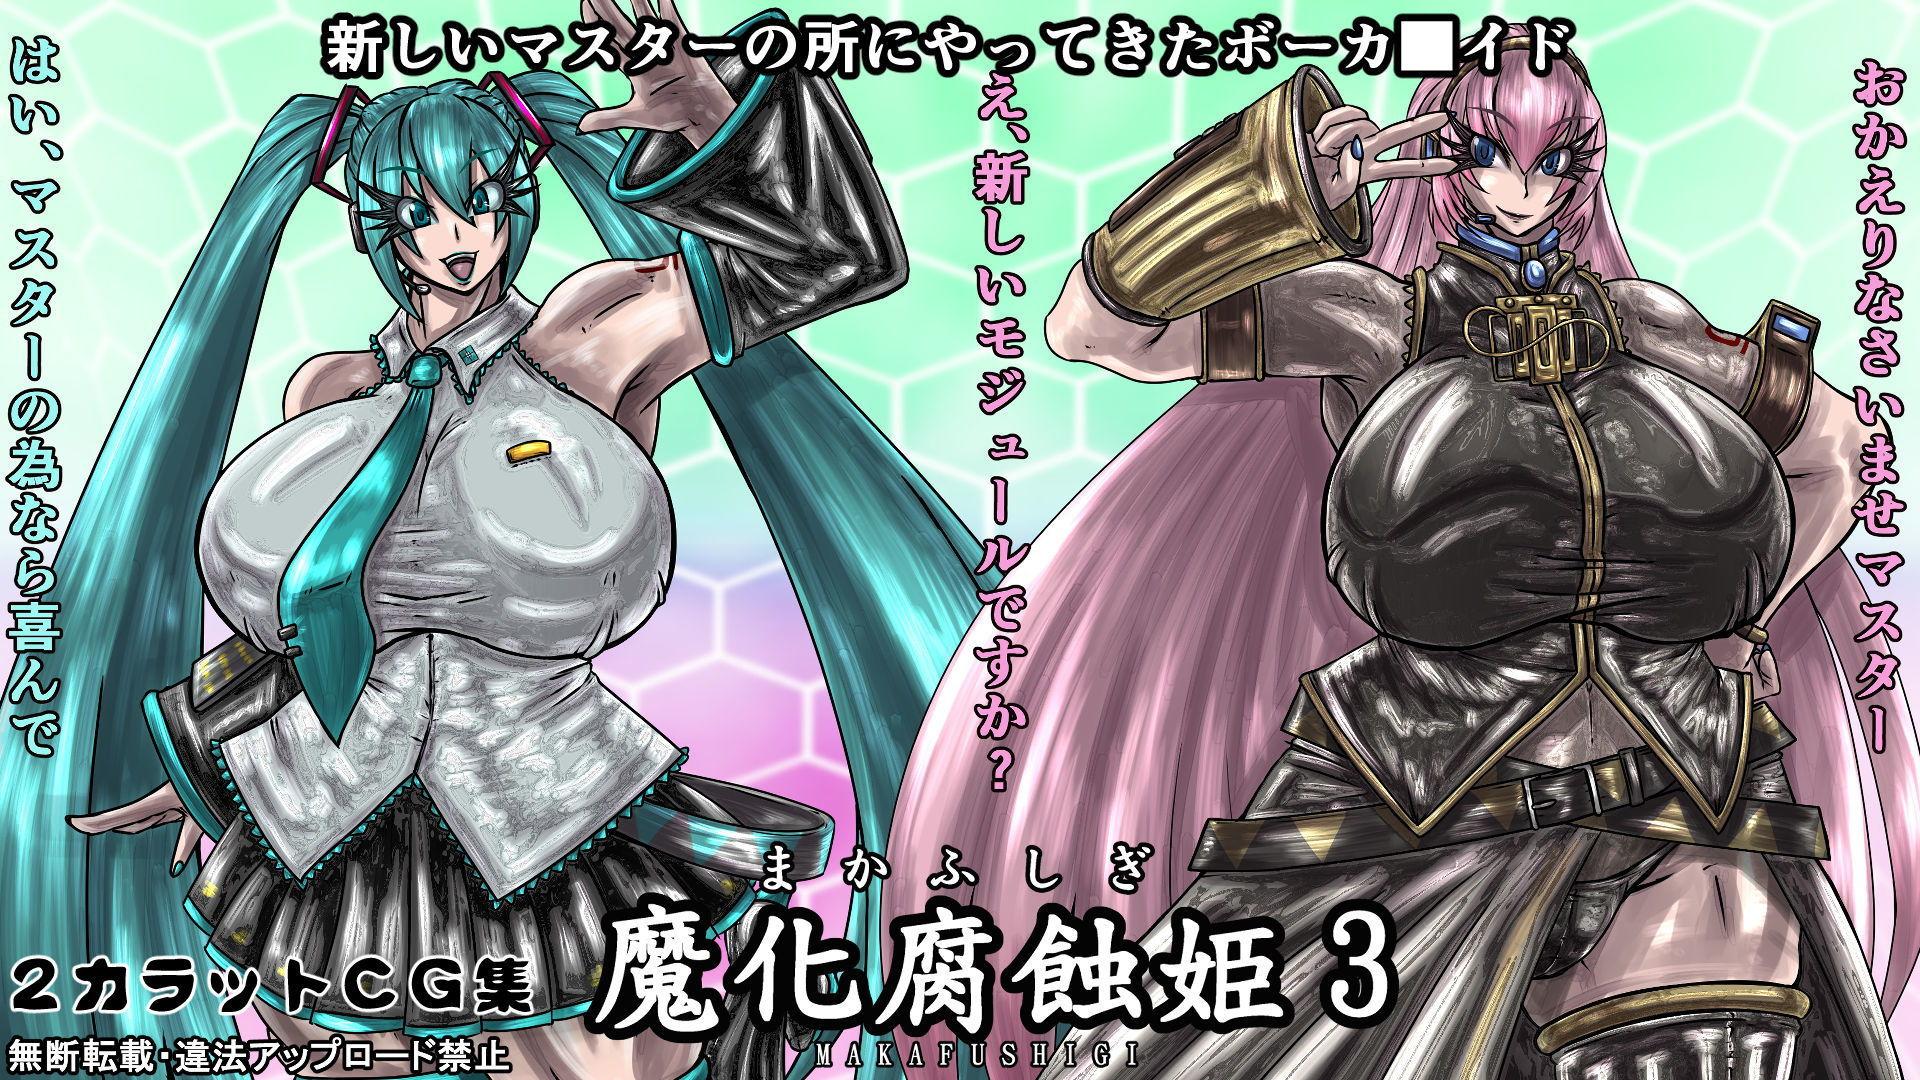 魔化腐蝕姫 3 エロ画像